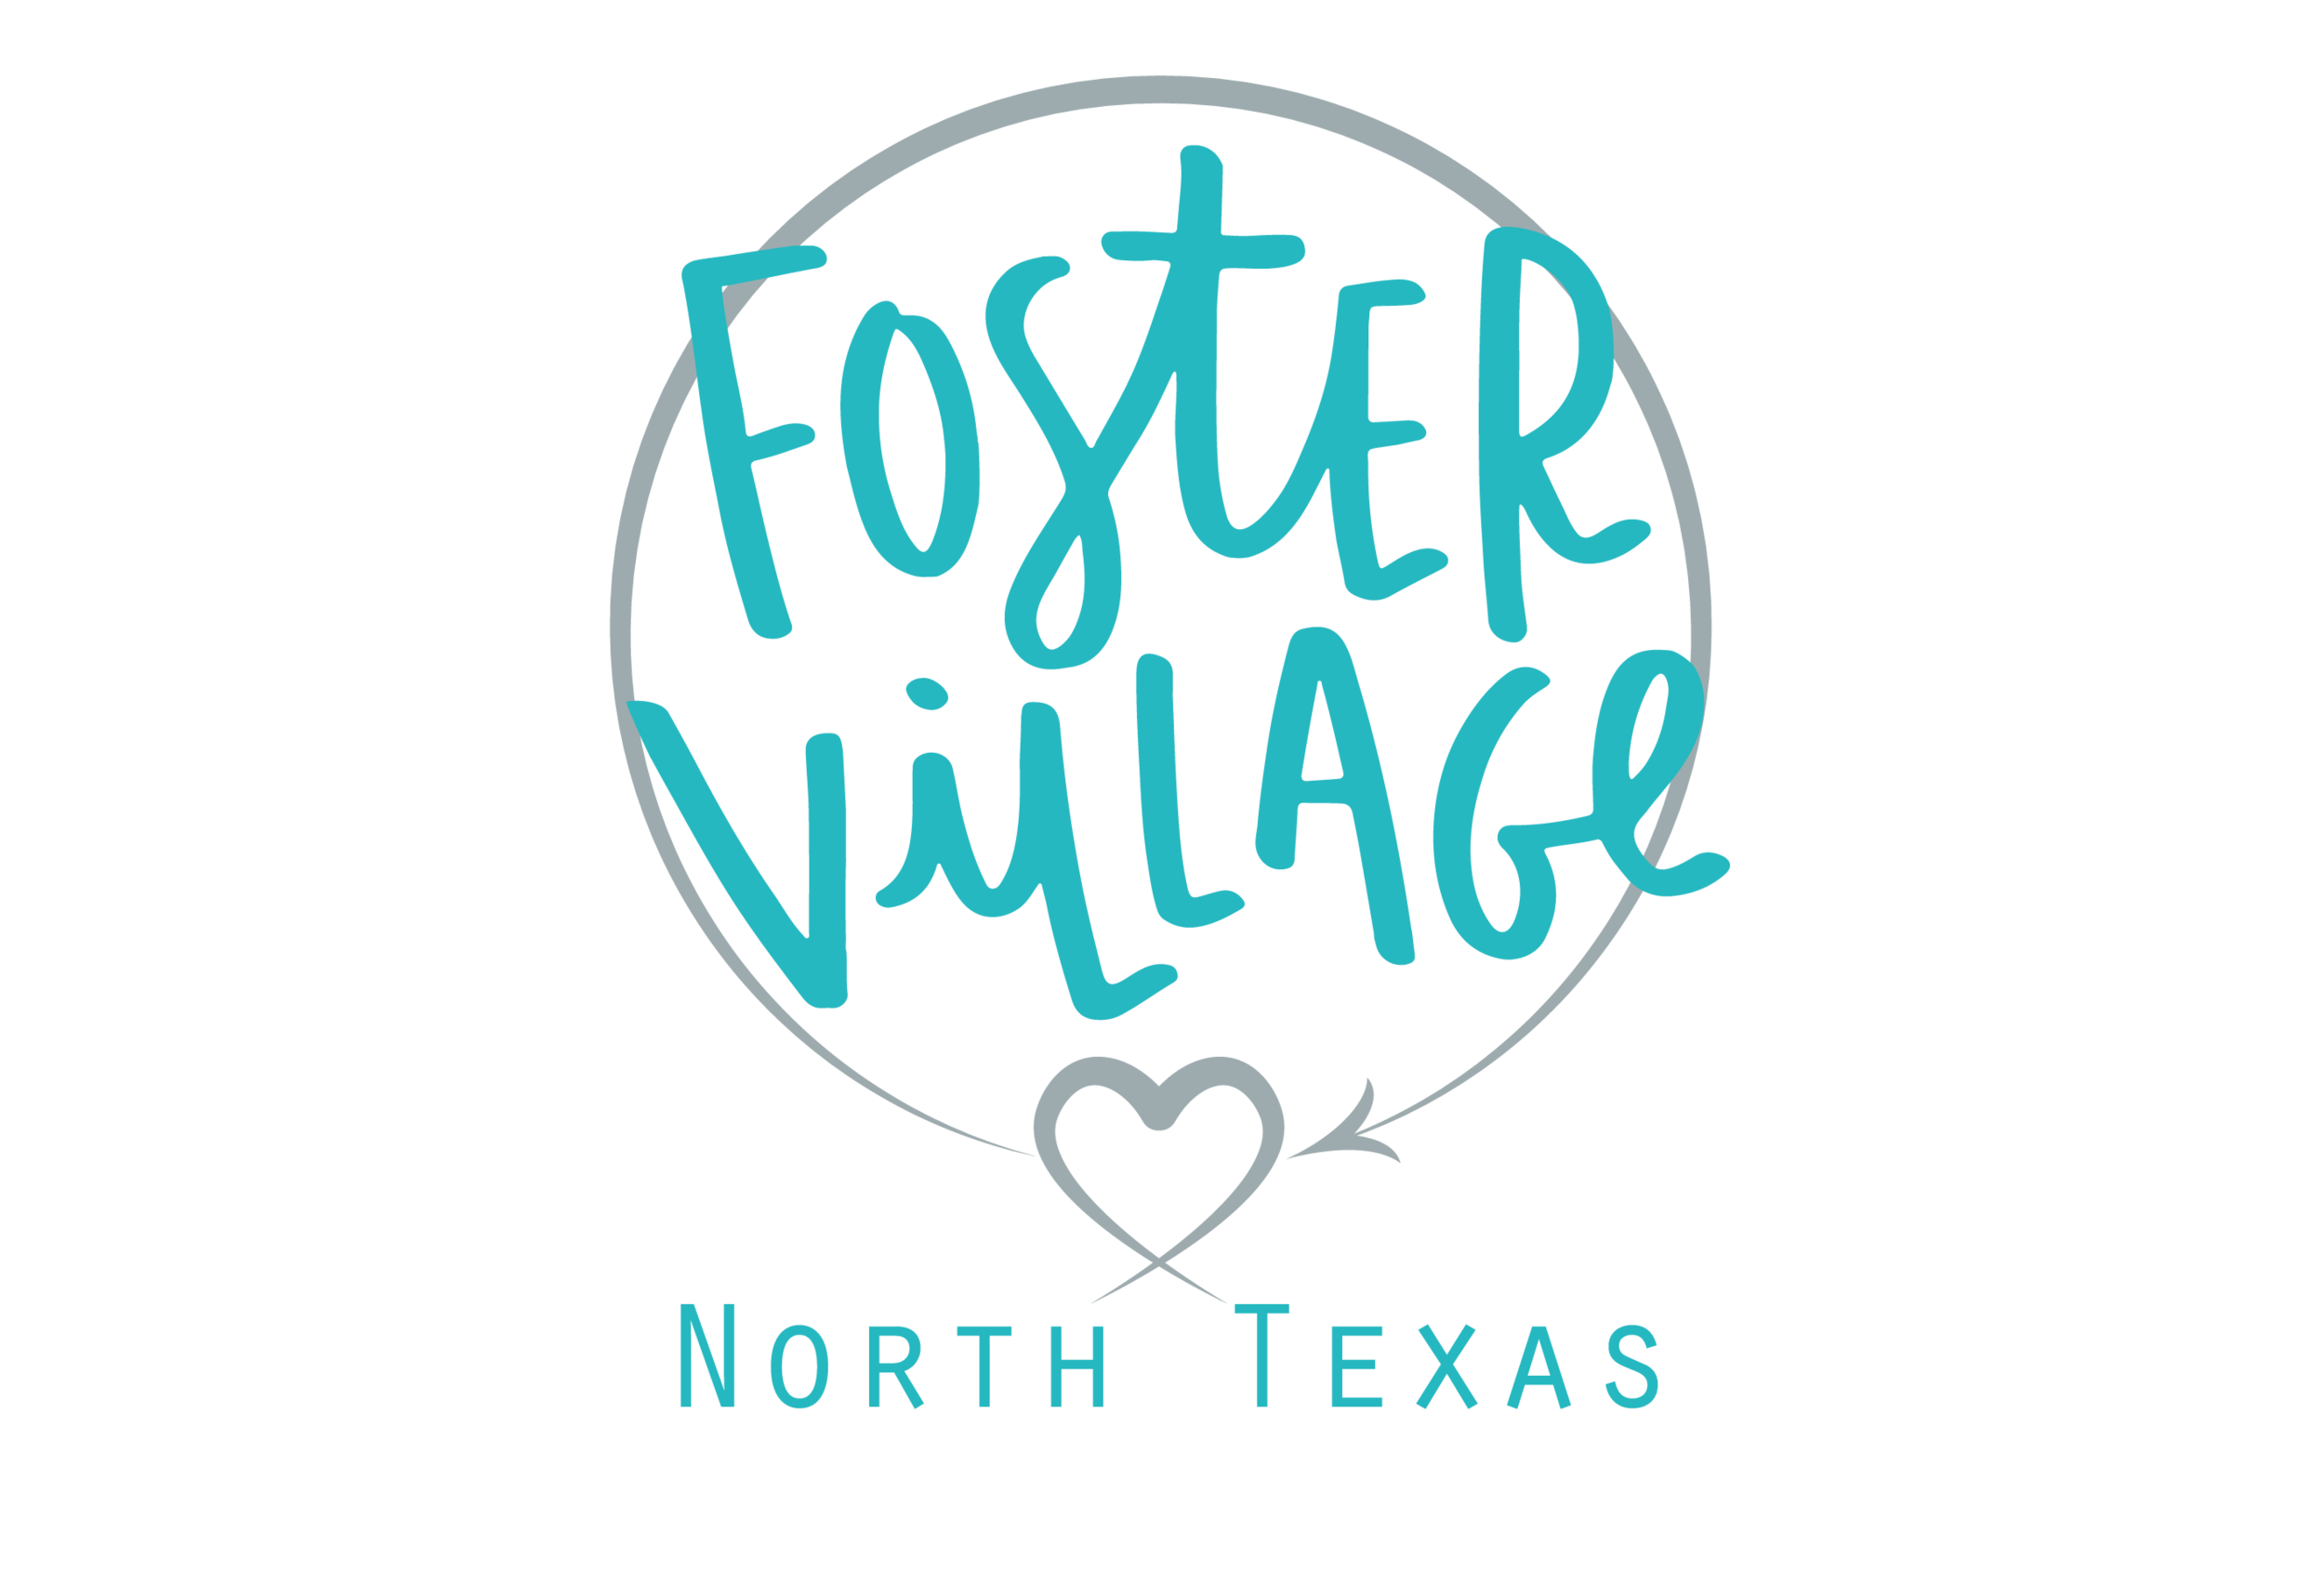 FV north texas logo.png